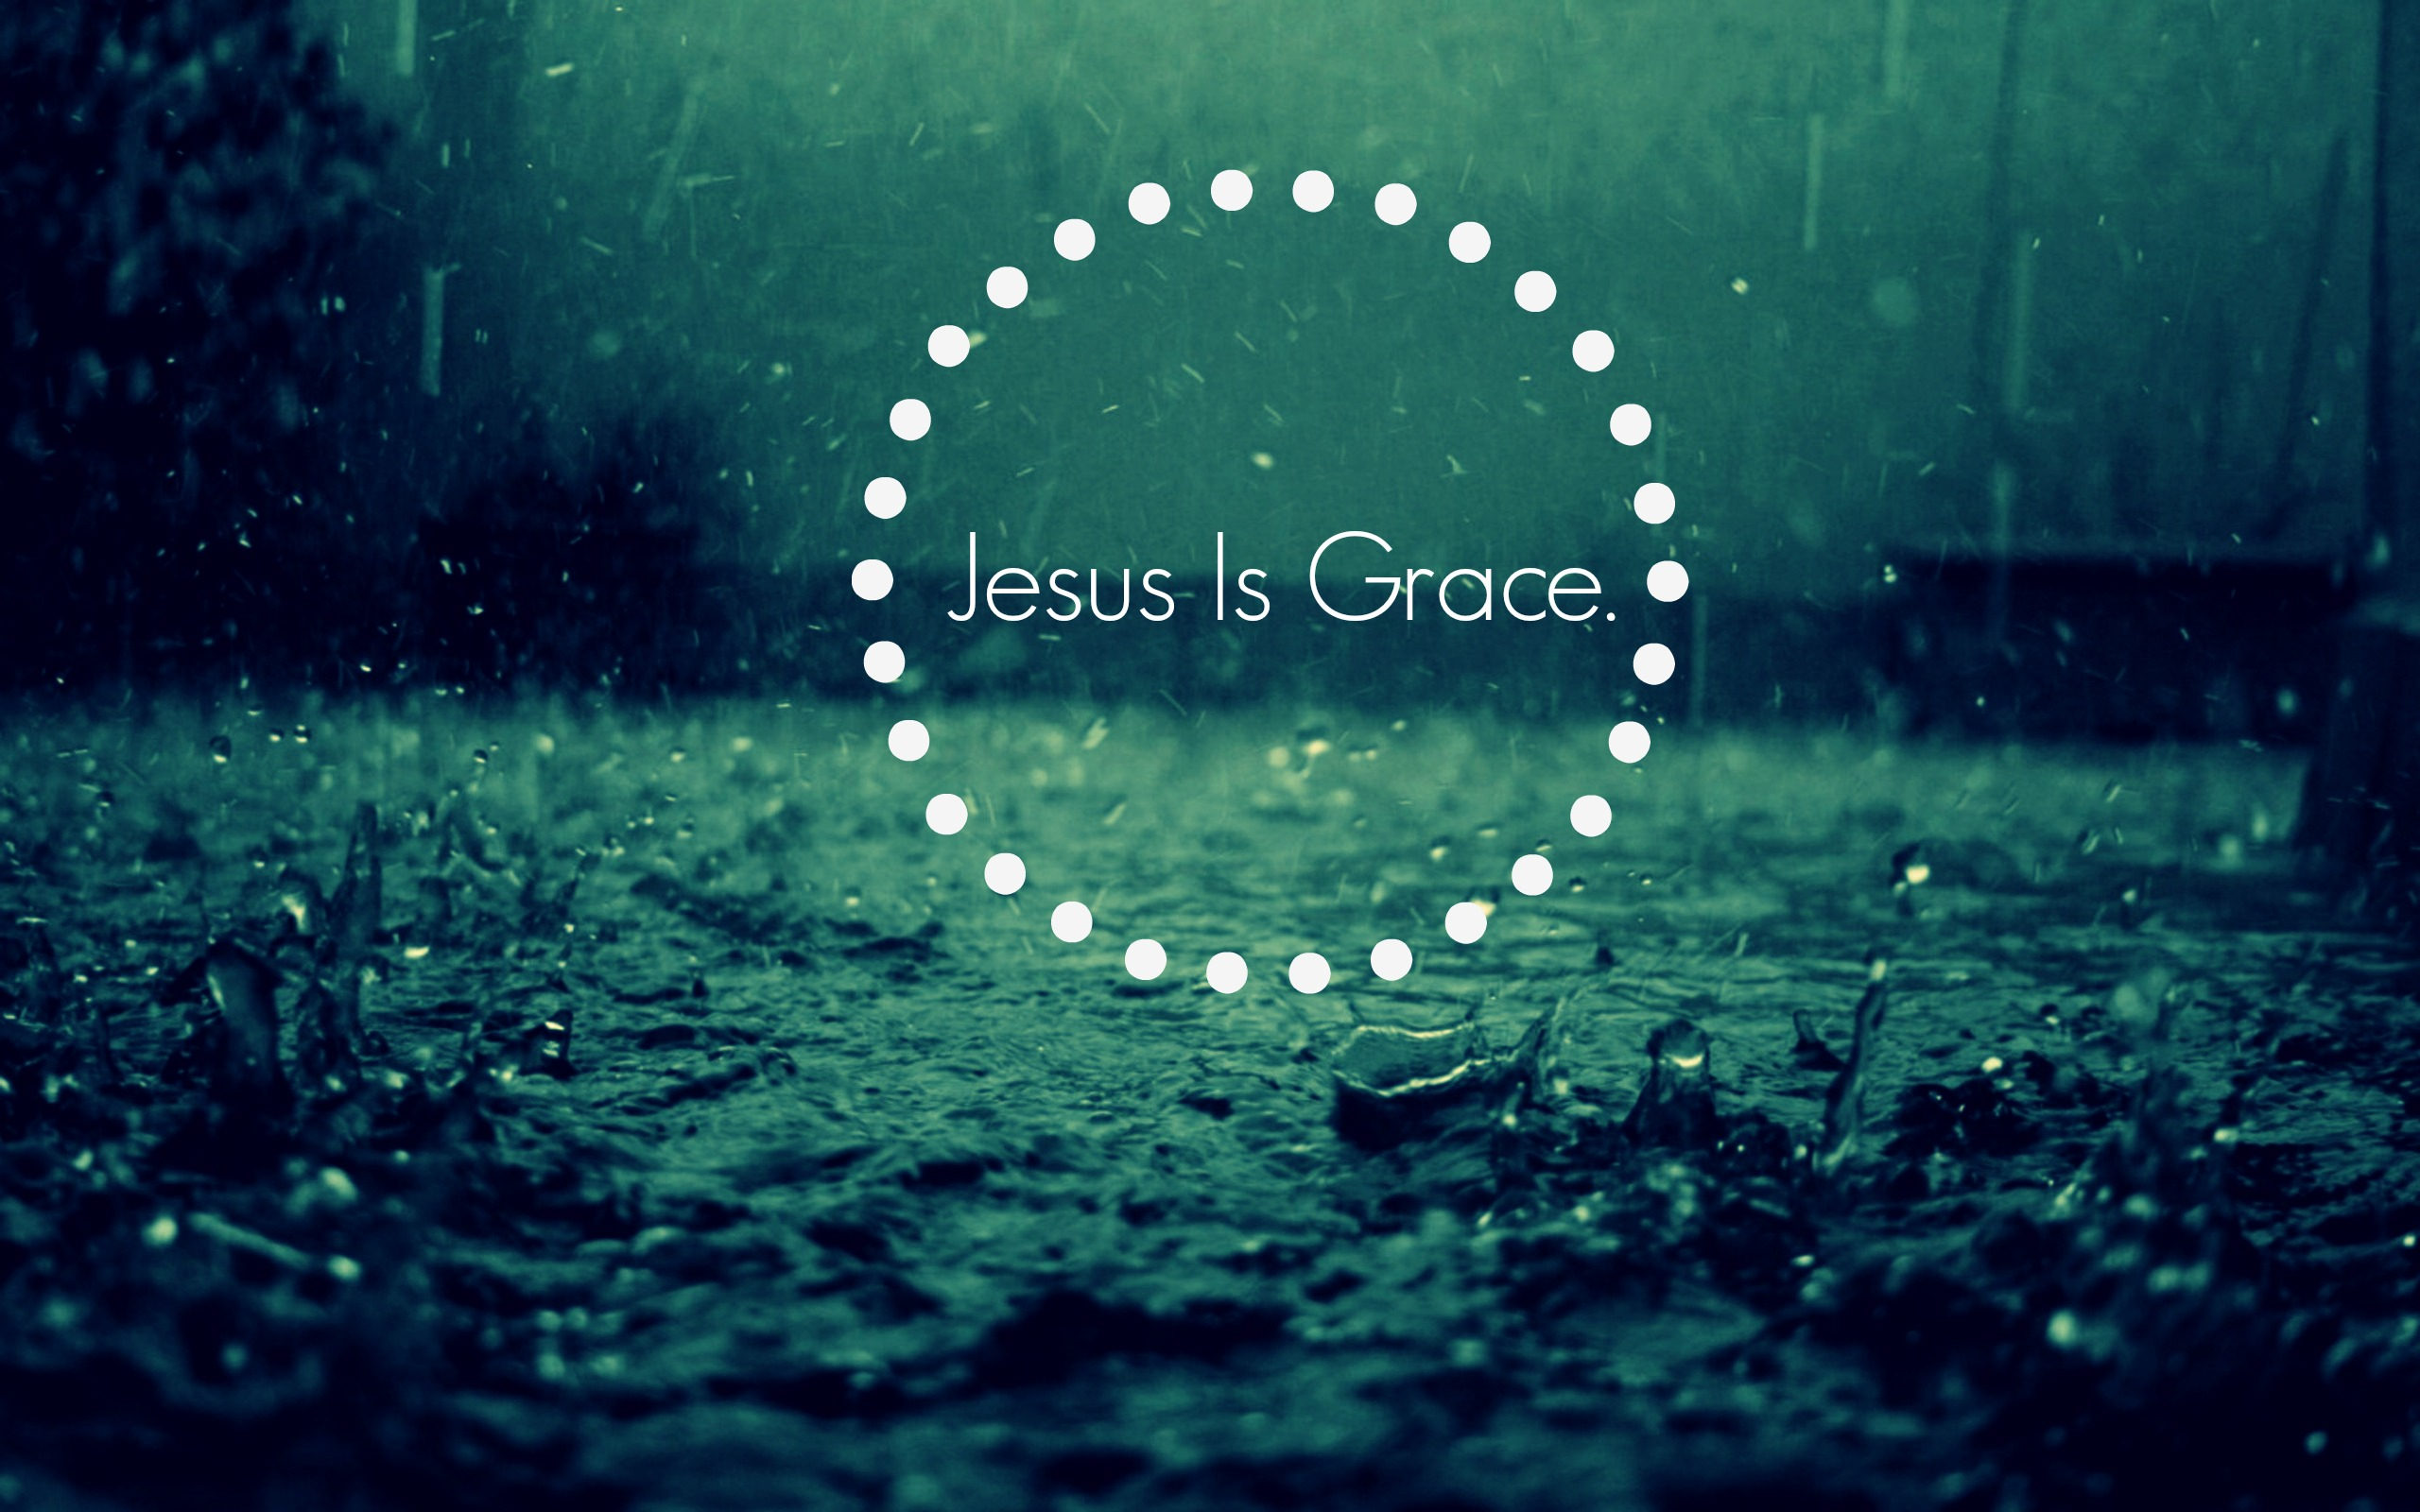 Contemporary Christian Background wwwgalleryhipcom 2560x1600